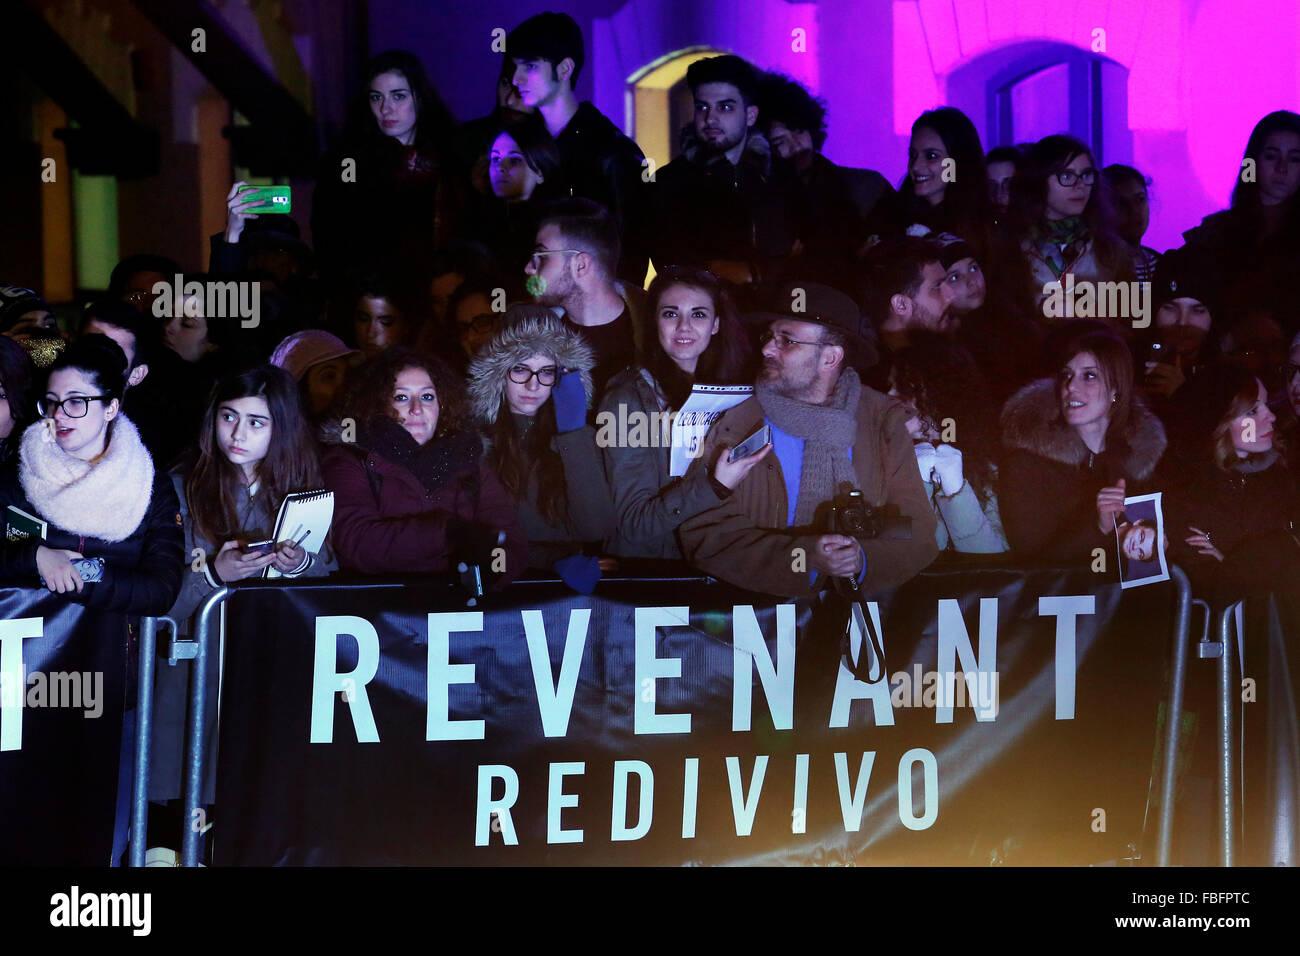 Roma, Italia. 15 Enero, 2016. Ventiladores, Casa del Cine. Anteprima redivivo. Revenant Alfombra Roja Premiere. Imagen De Stock